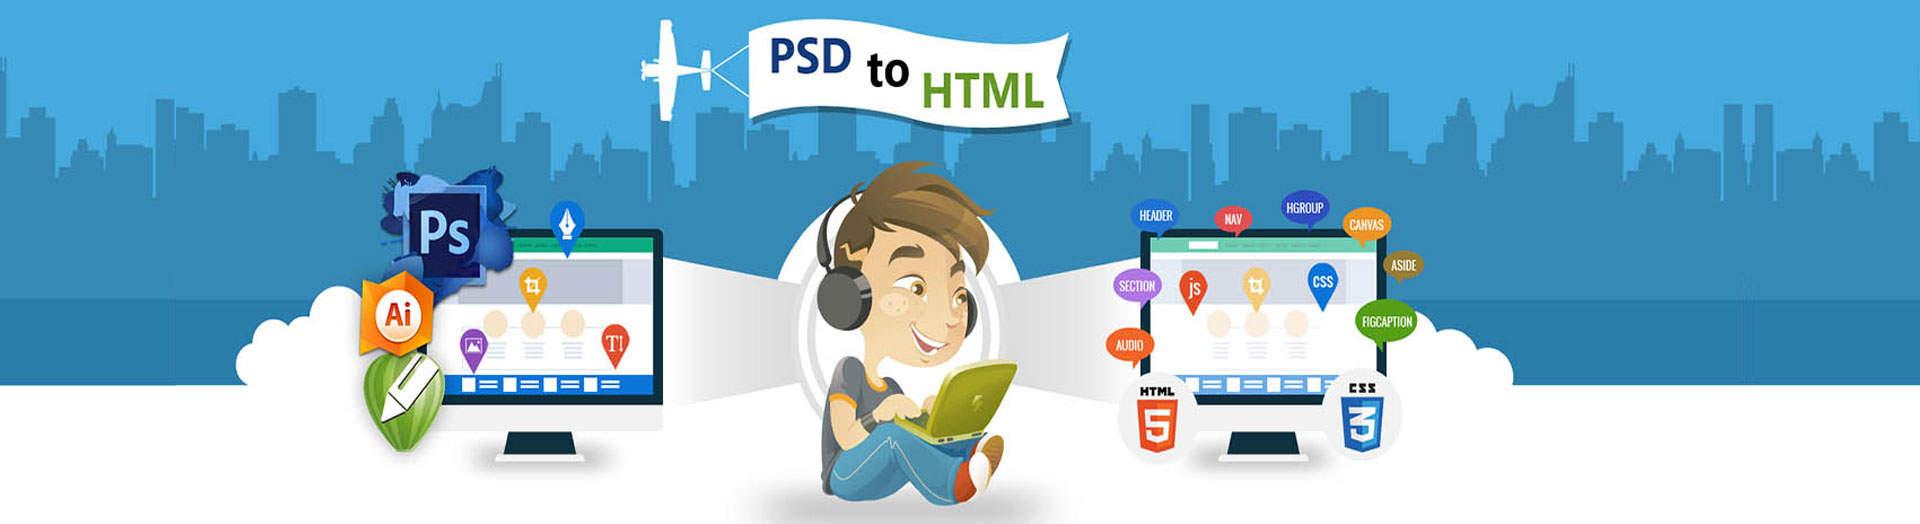 PSD to HTML Development